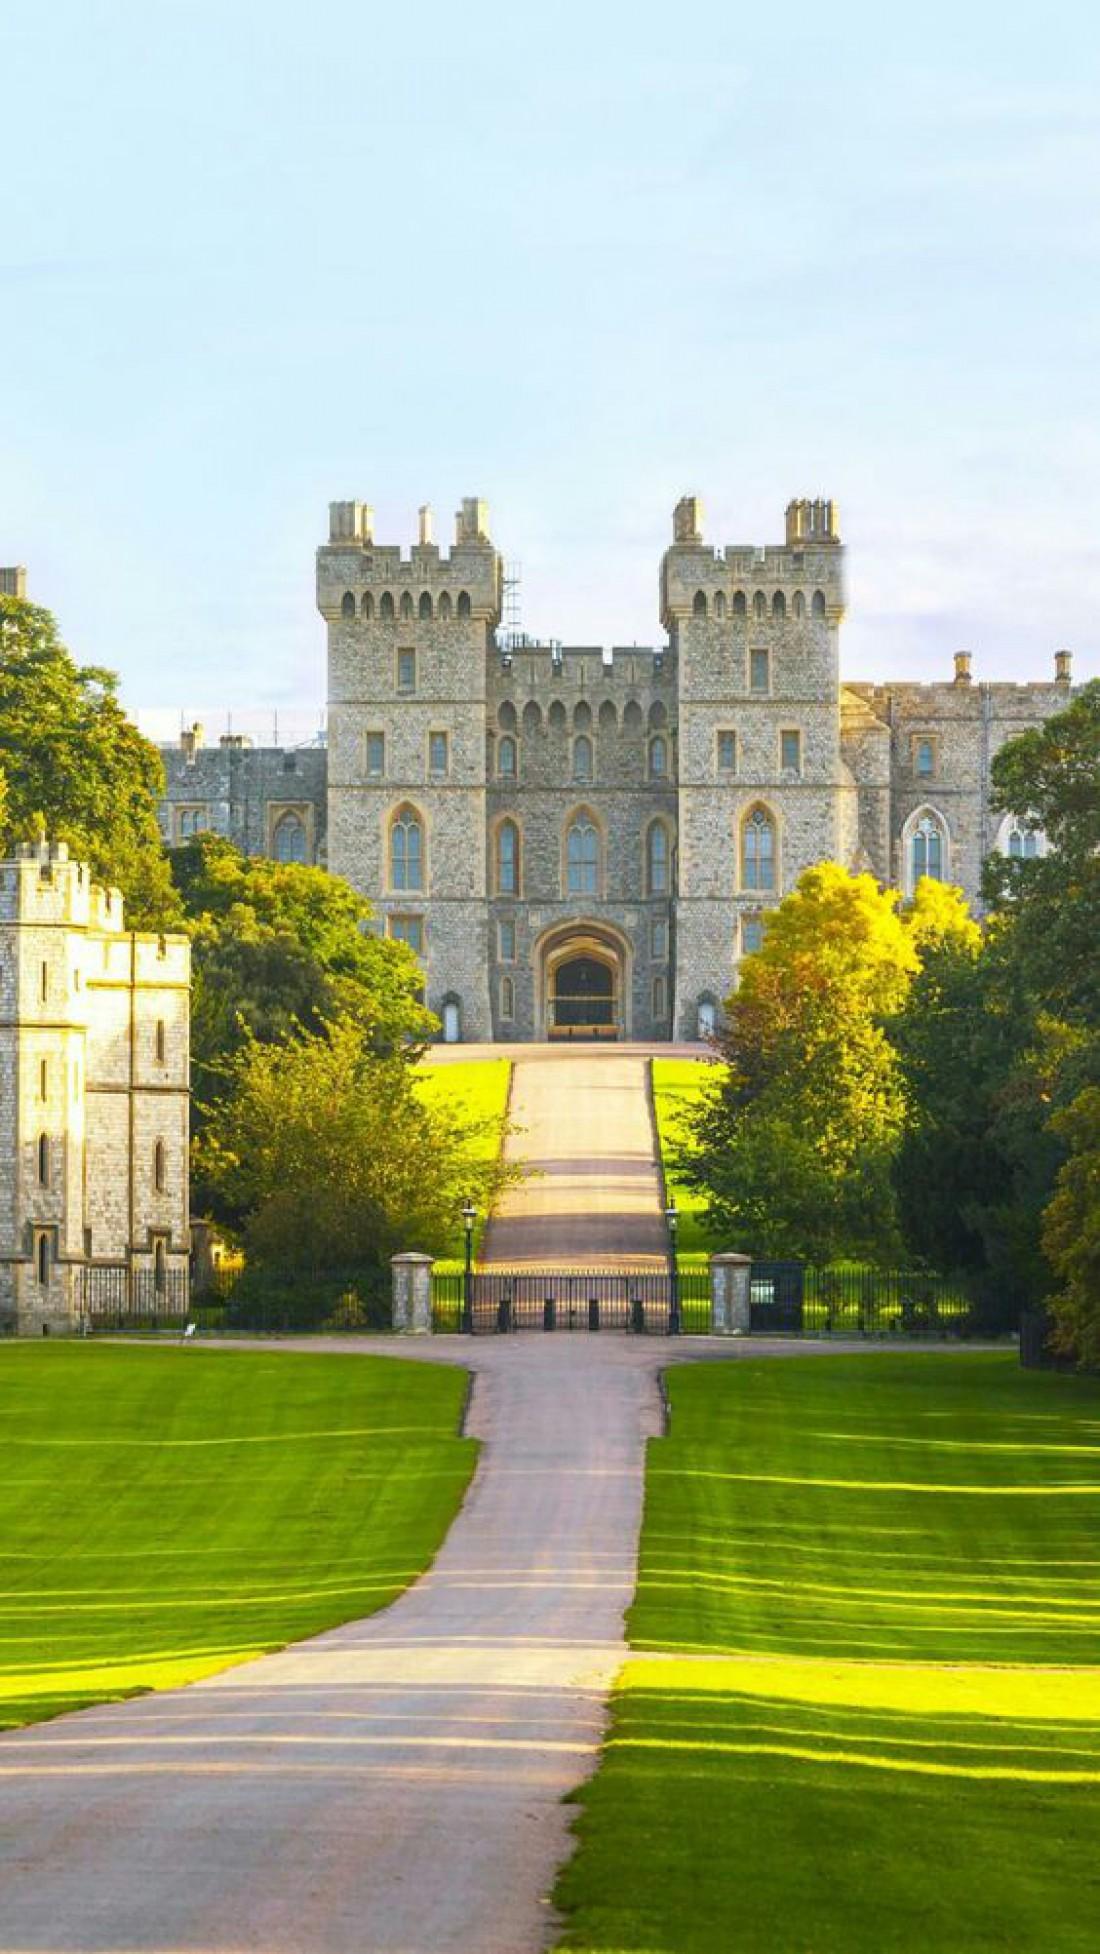 Виндзорский замок - резиденция английских королей